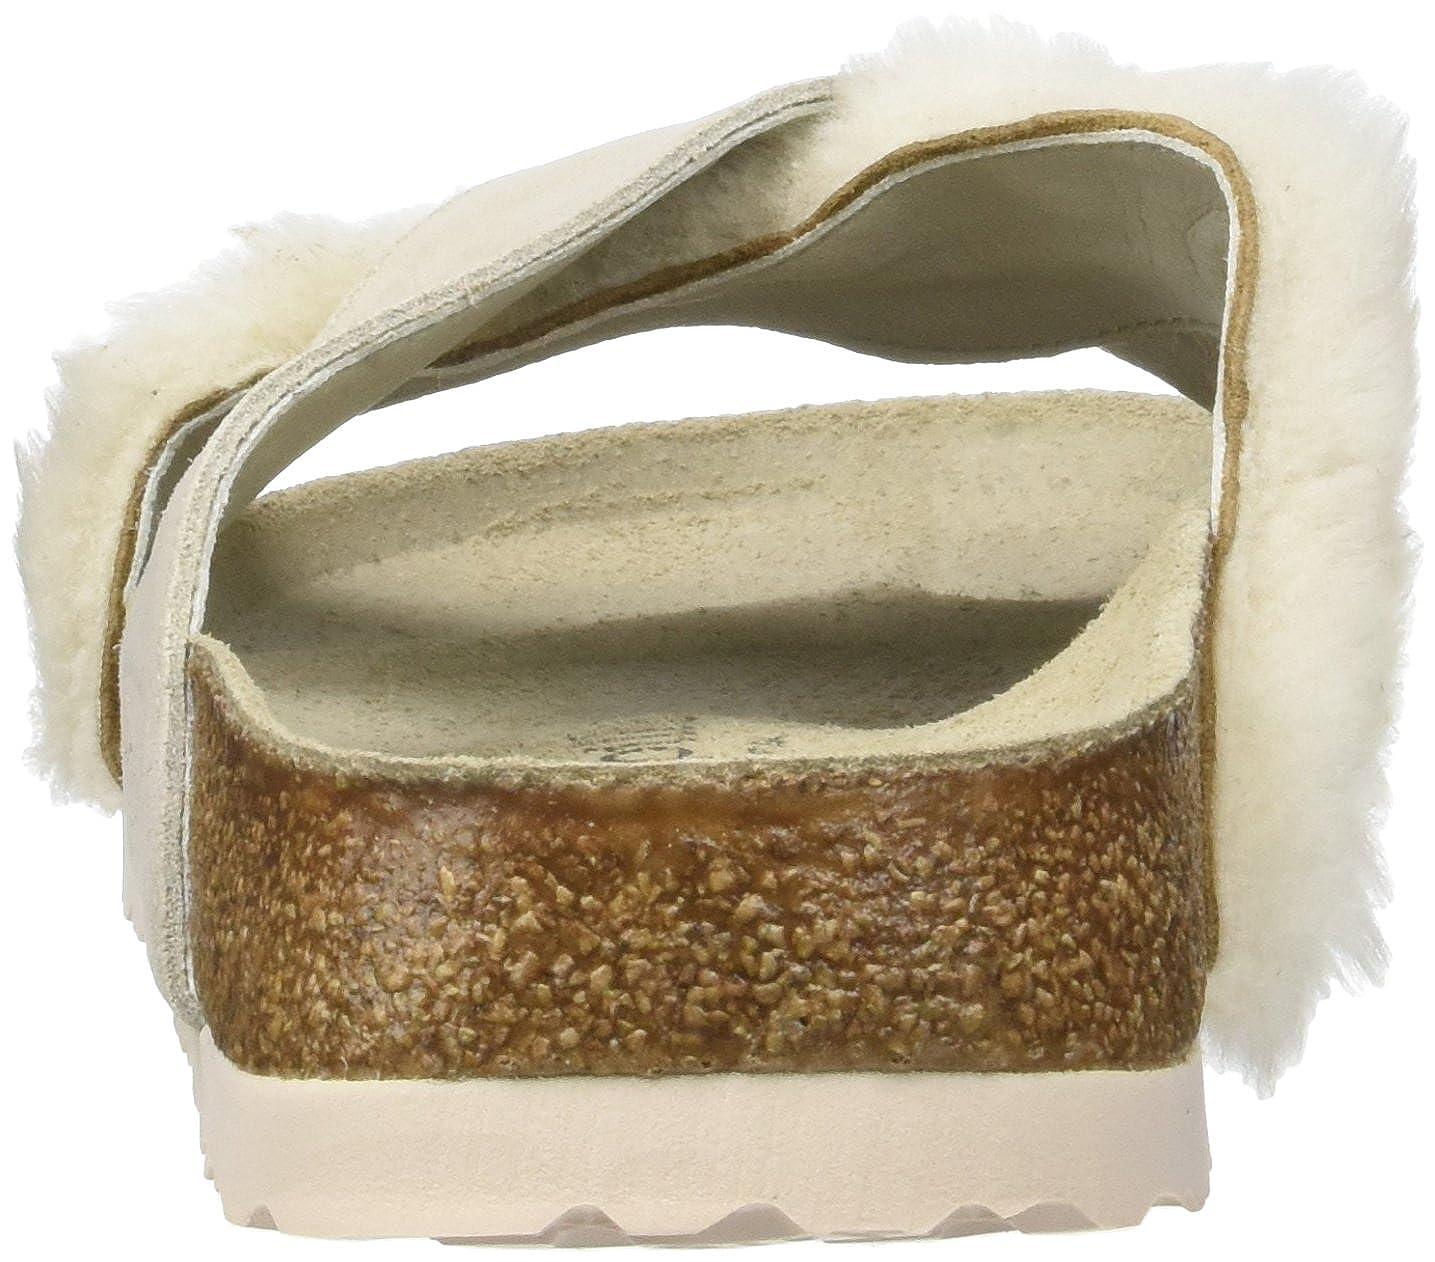 45c147e5b743 Amazon.com  Papillio Daytona Suede Leather Fur Cozy Off White  Shoes